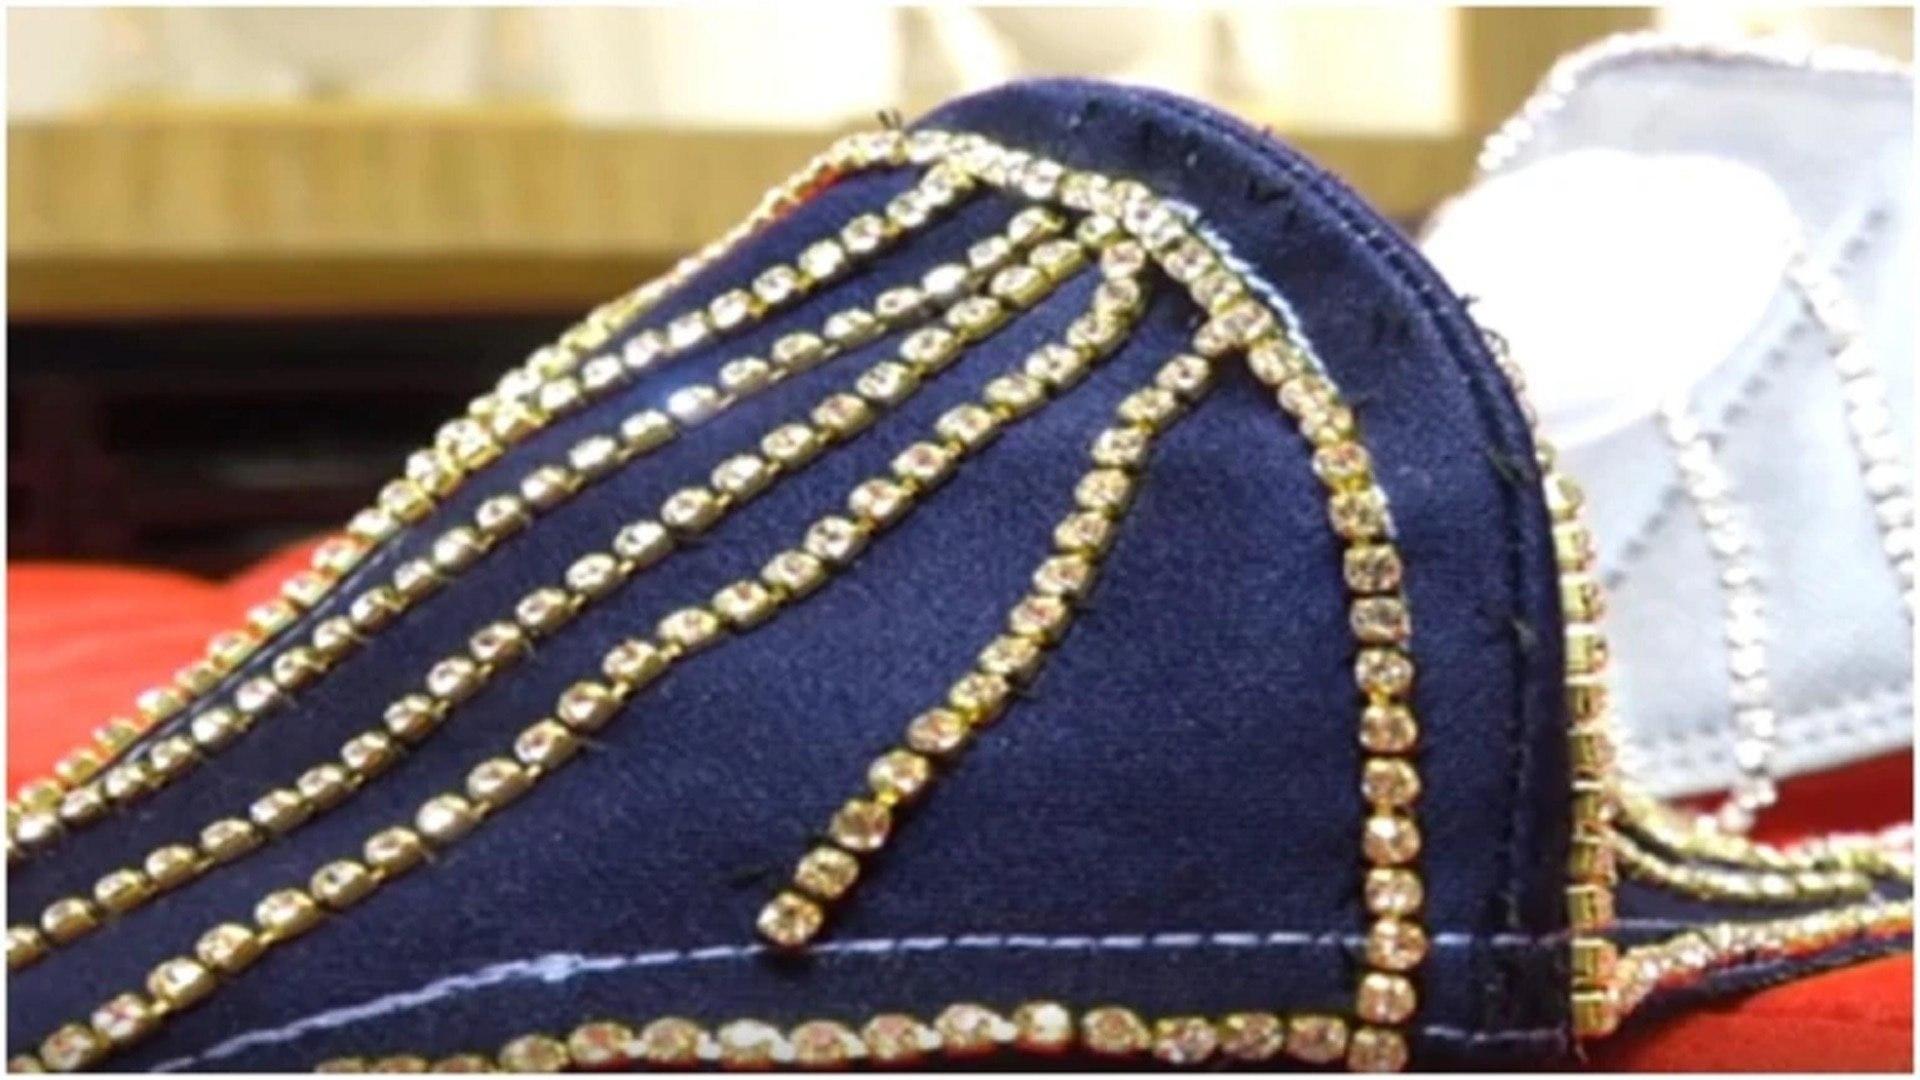 Coronavirus: Masks adorned with diamonds worth Rs 4 lakh